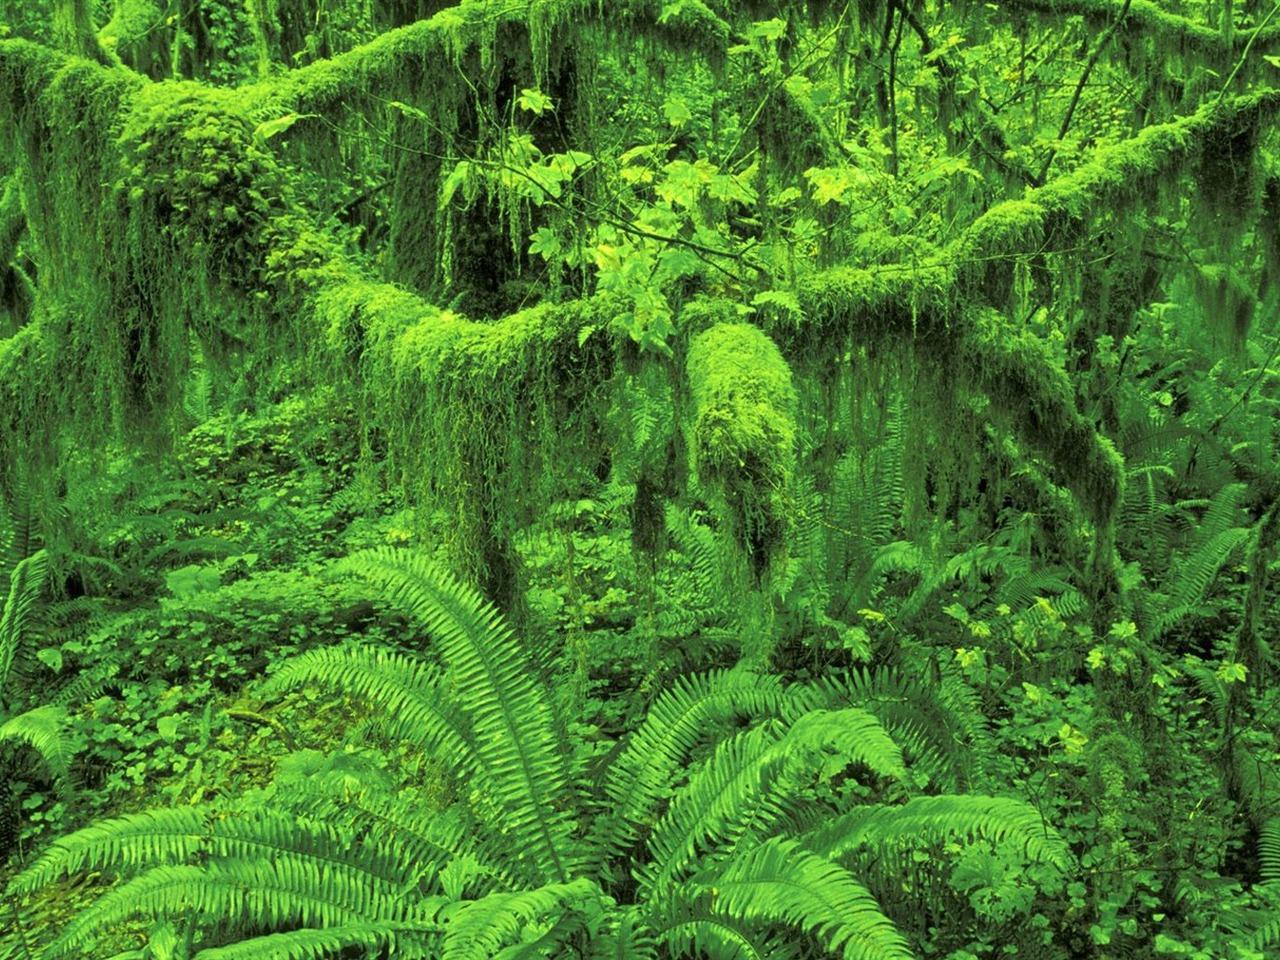 Olympic National Park-Huo rainforest wallpaper-1280x960 Download | 10wallpaper.com